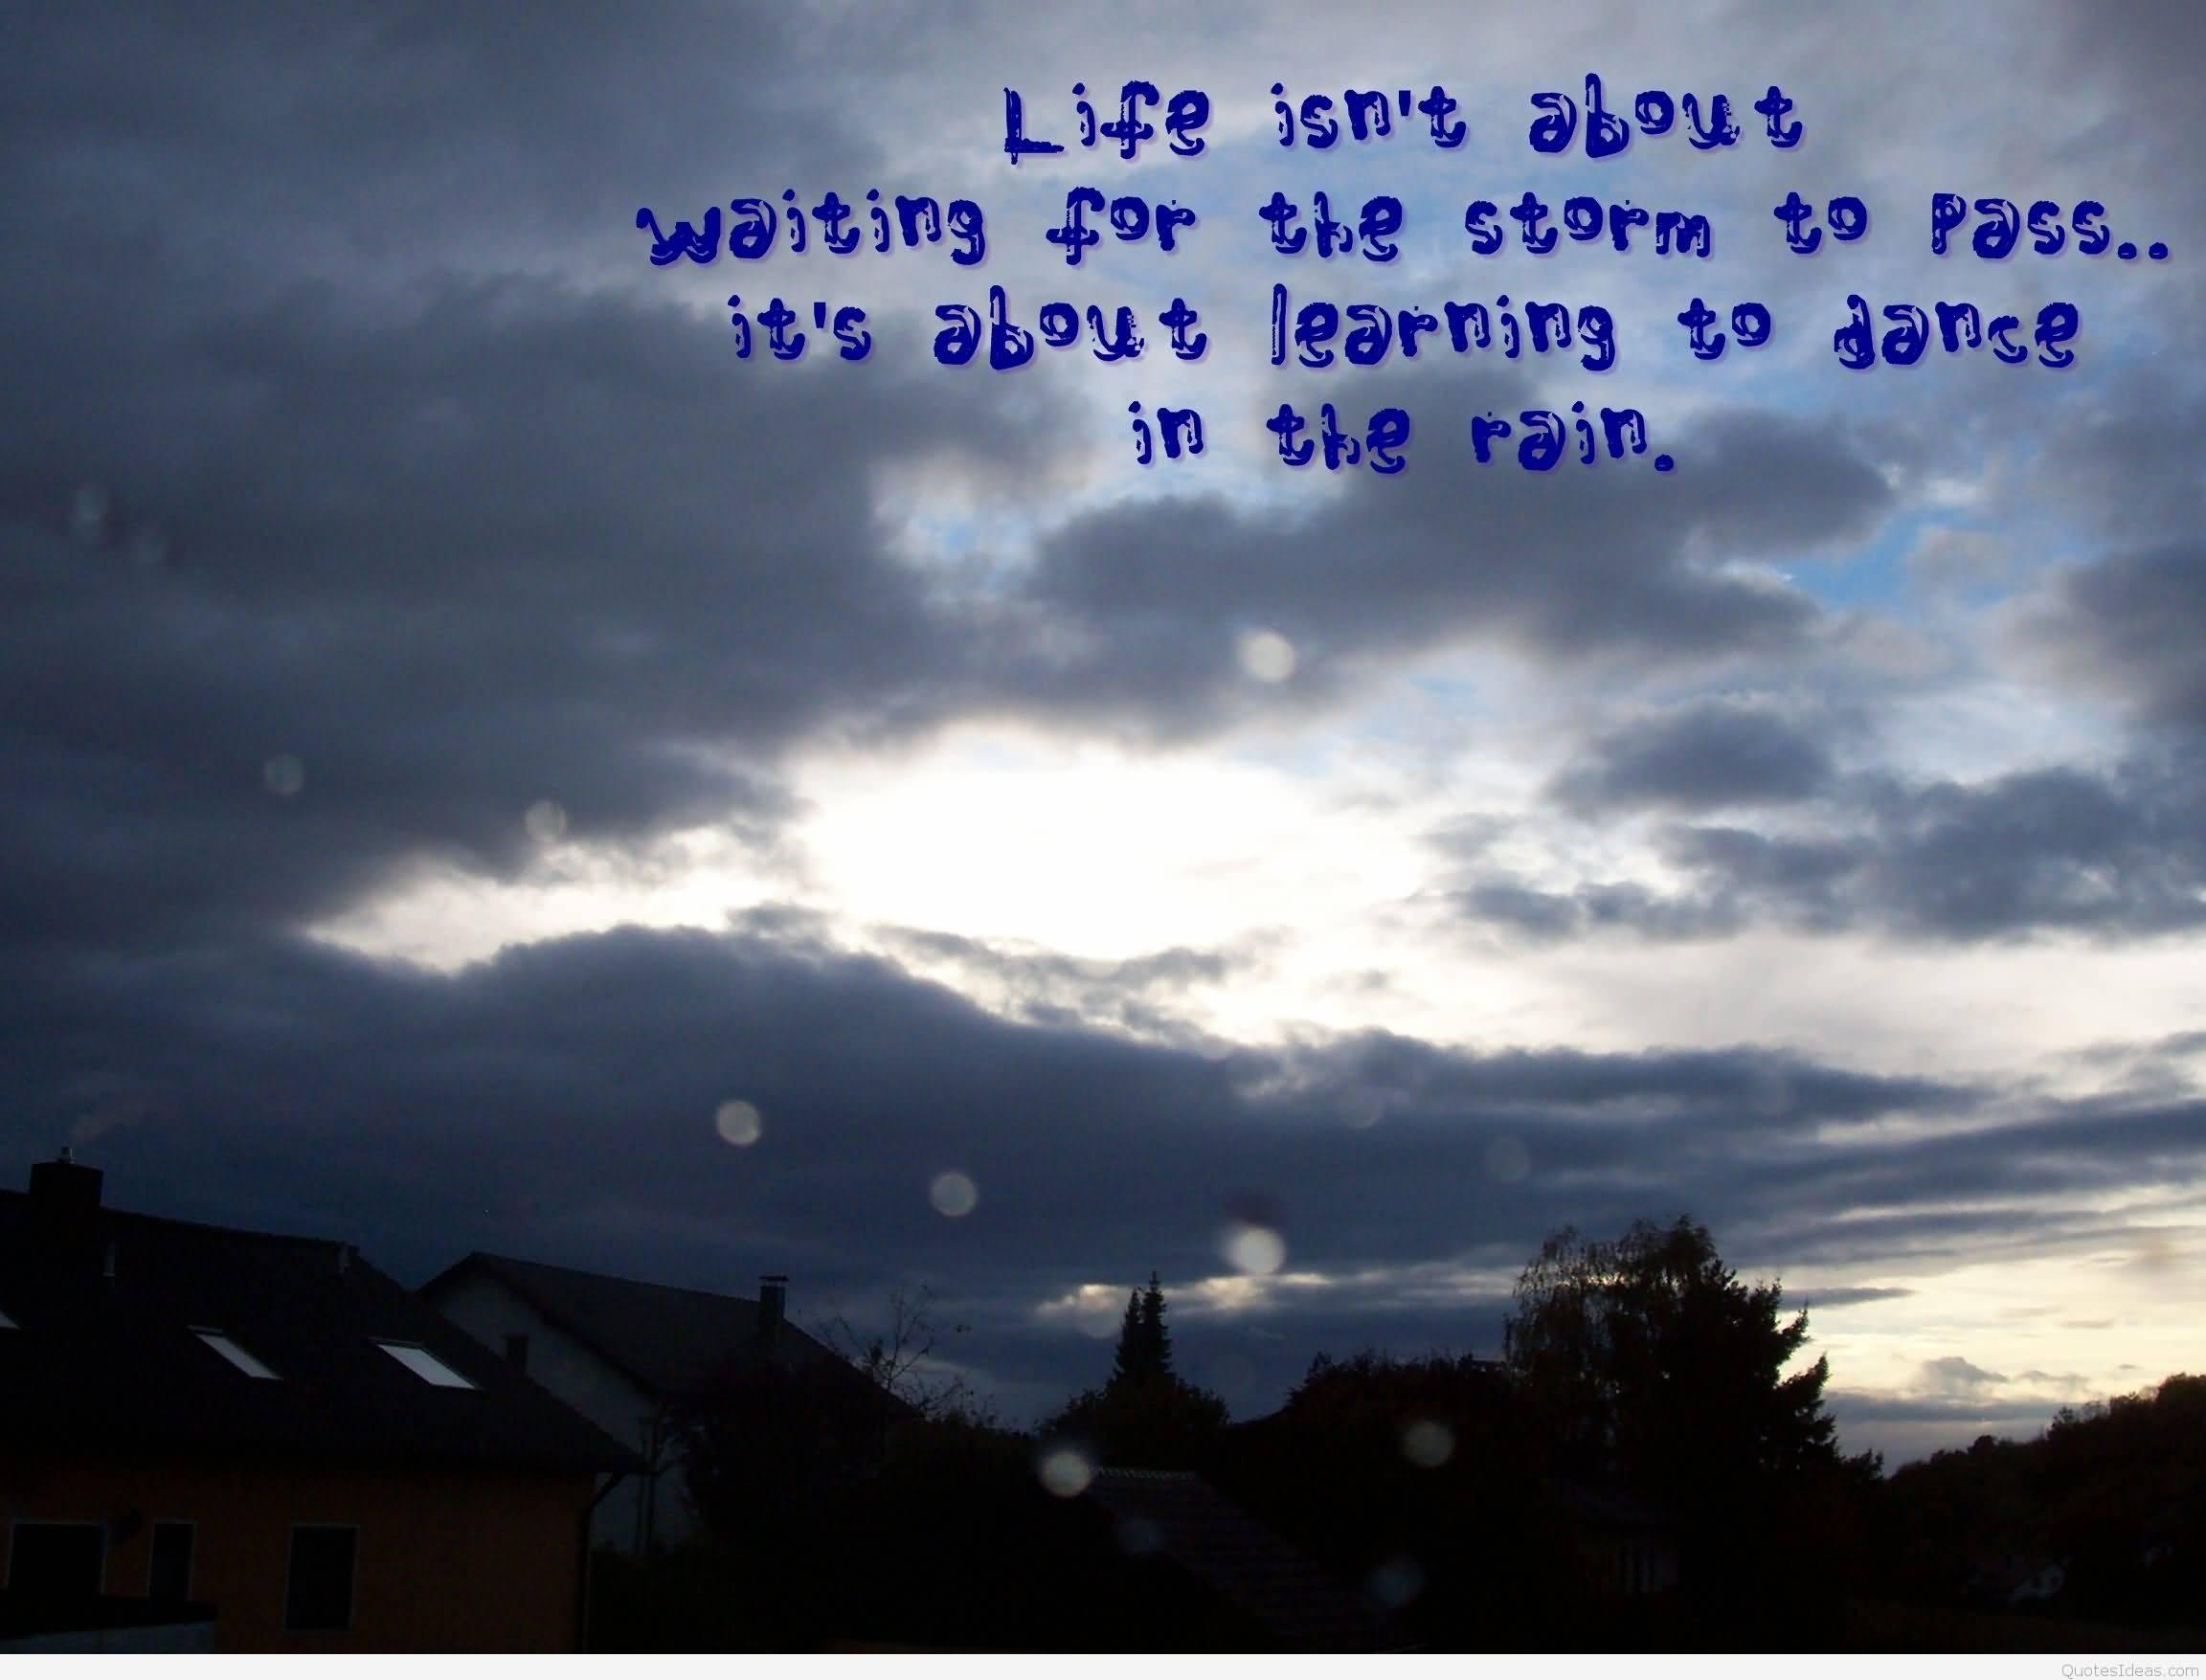 Poem Quotes About Life Poem Quotes About Life 11  Quotesbae